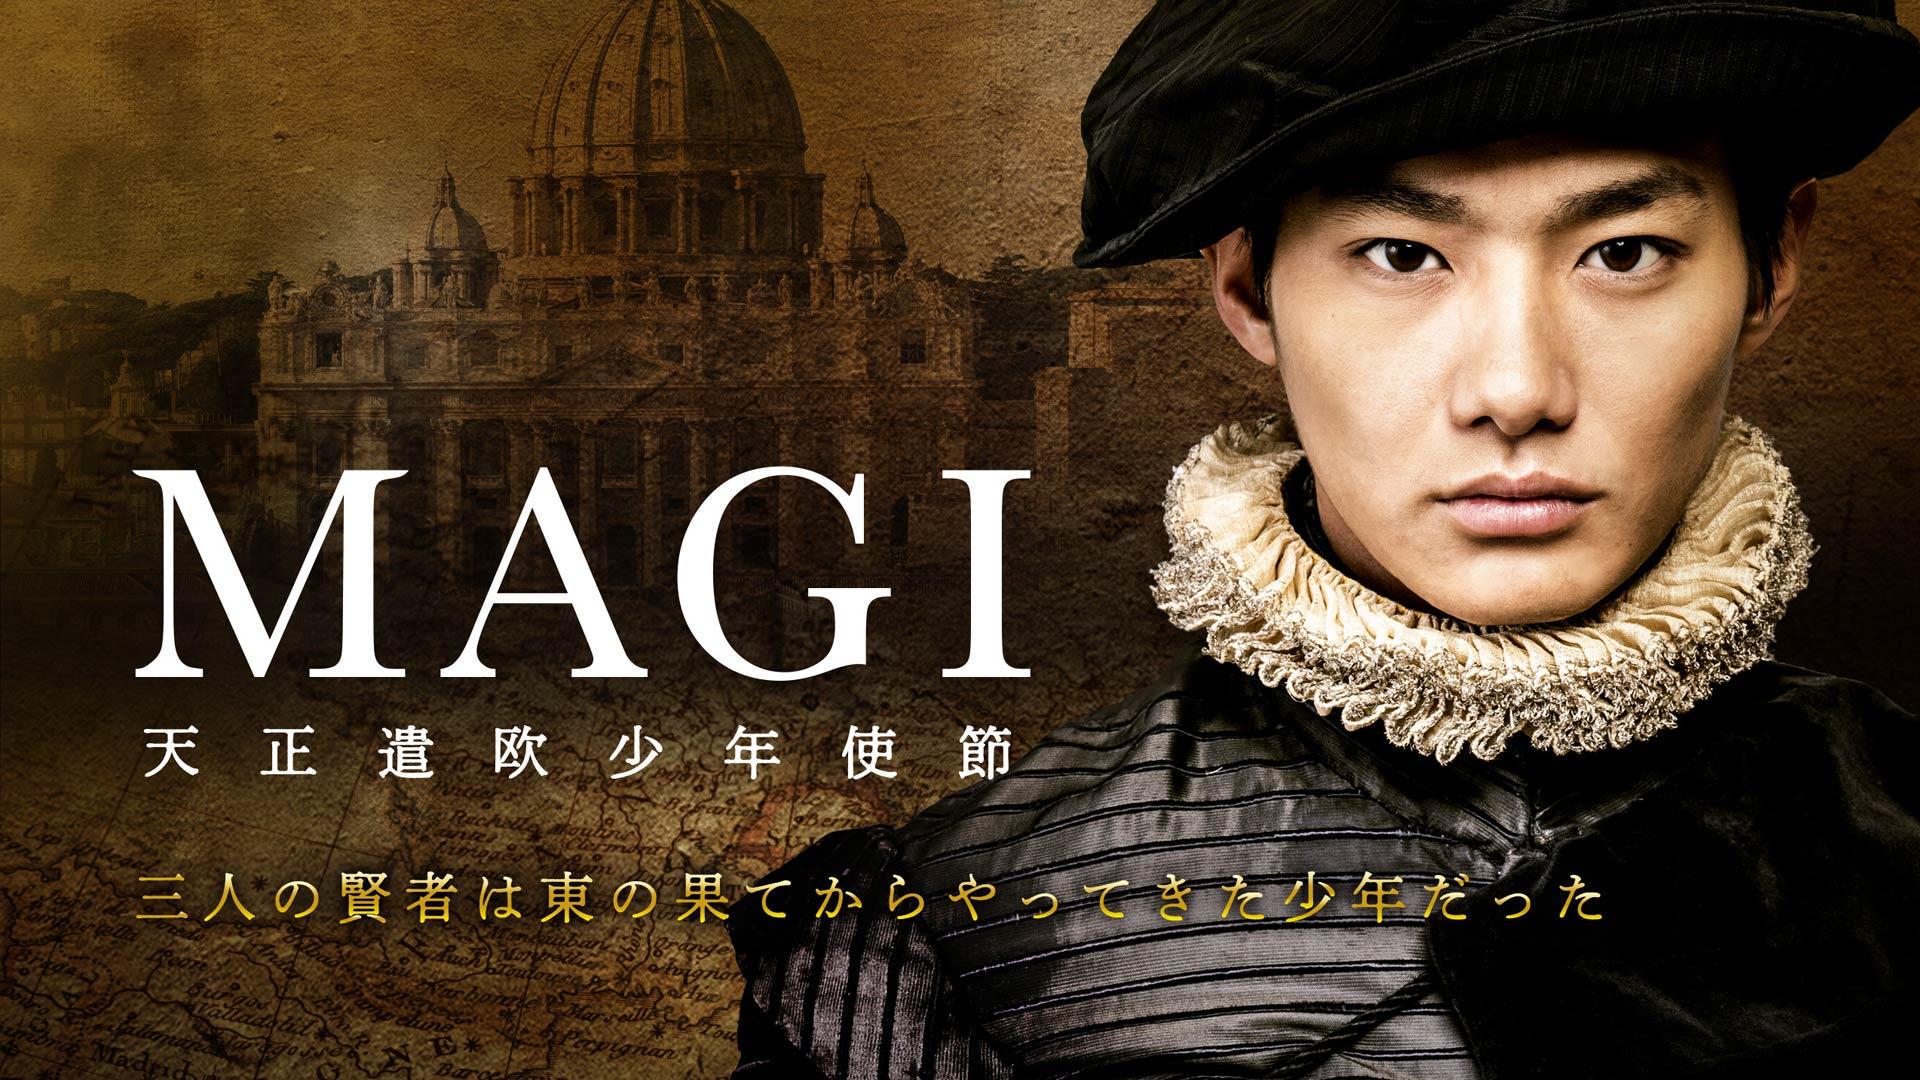 MAGI  The Tensho Boys' Embassy - Season 1  (Japanese Ver)